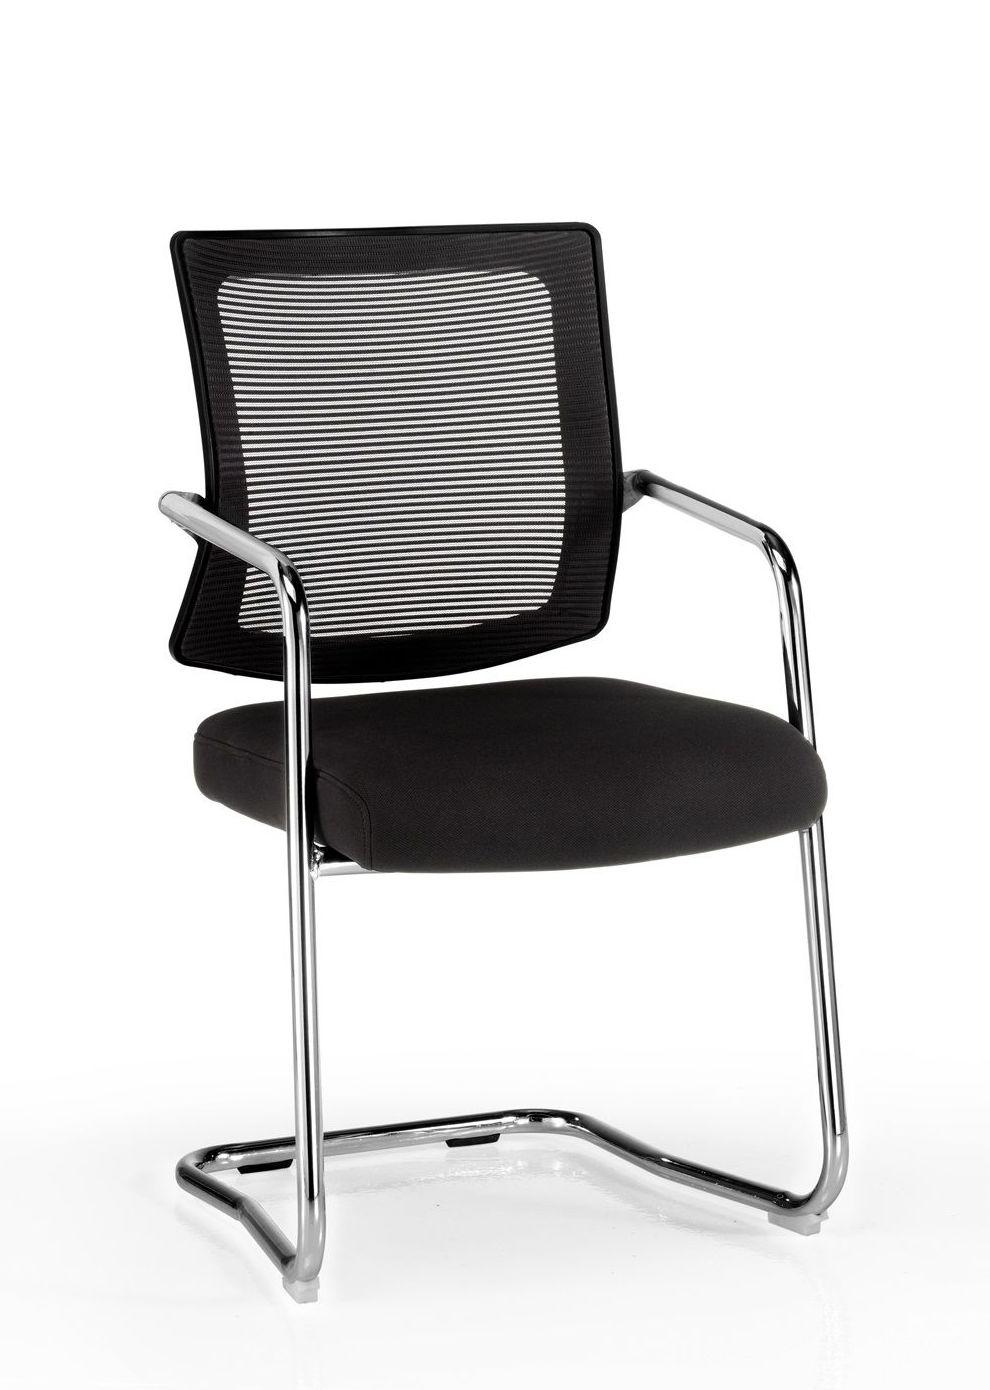 sillón confidente de malla y pie de patín mod. J.R.